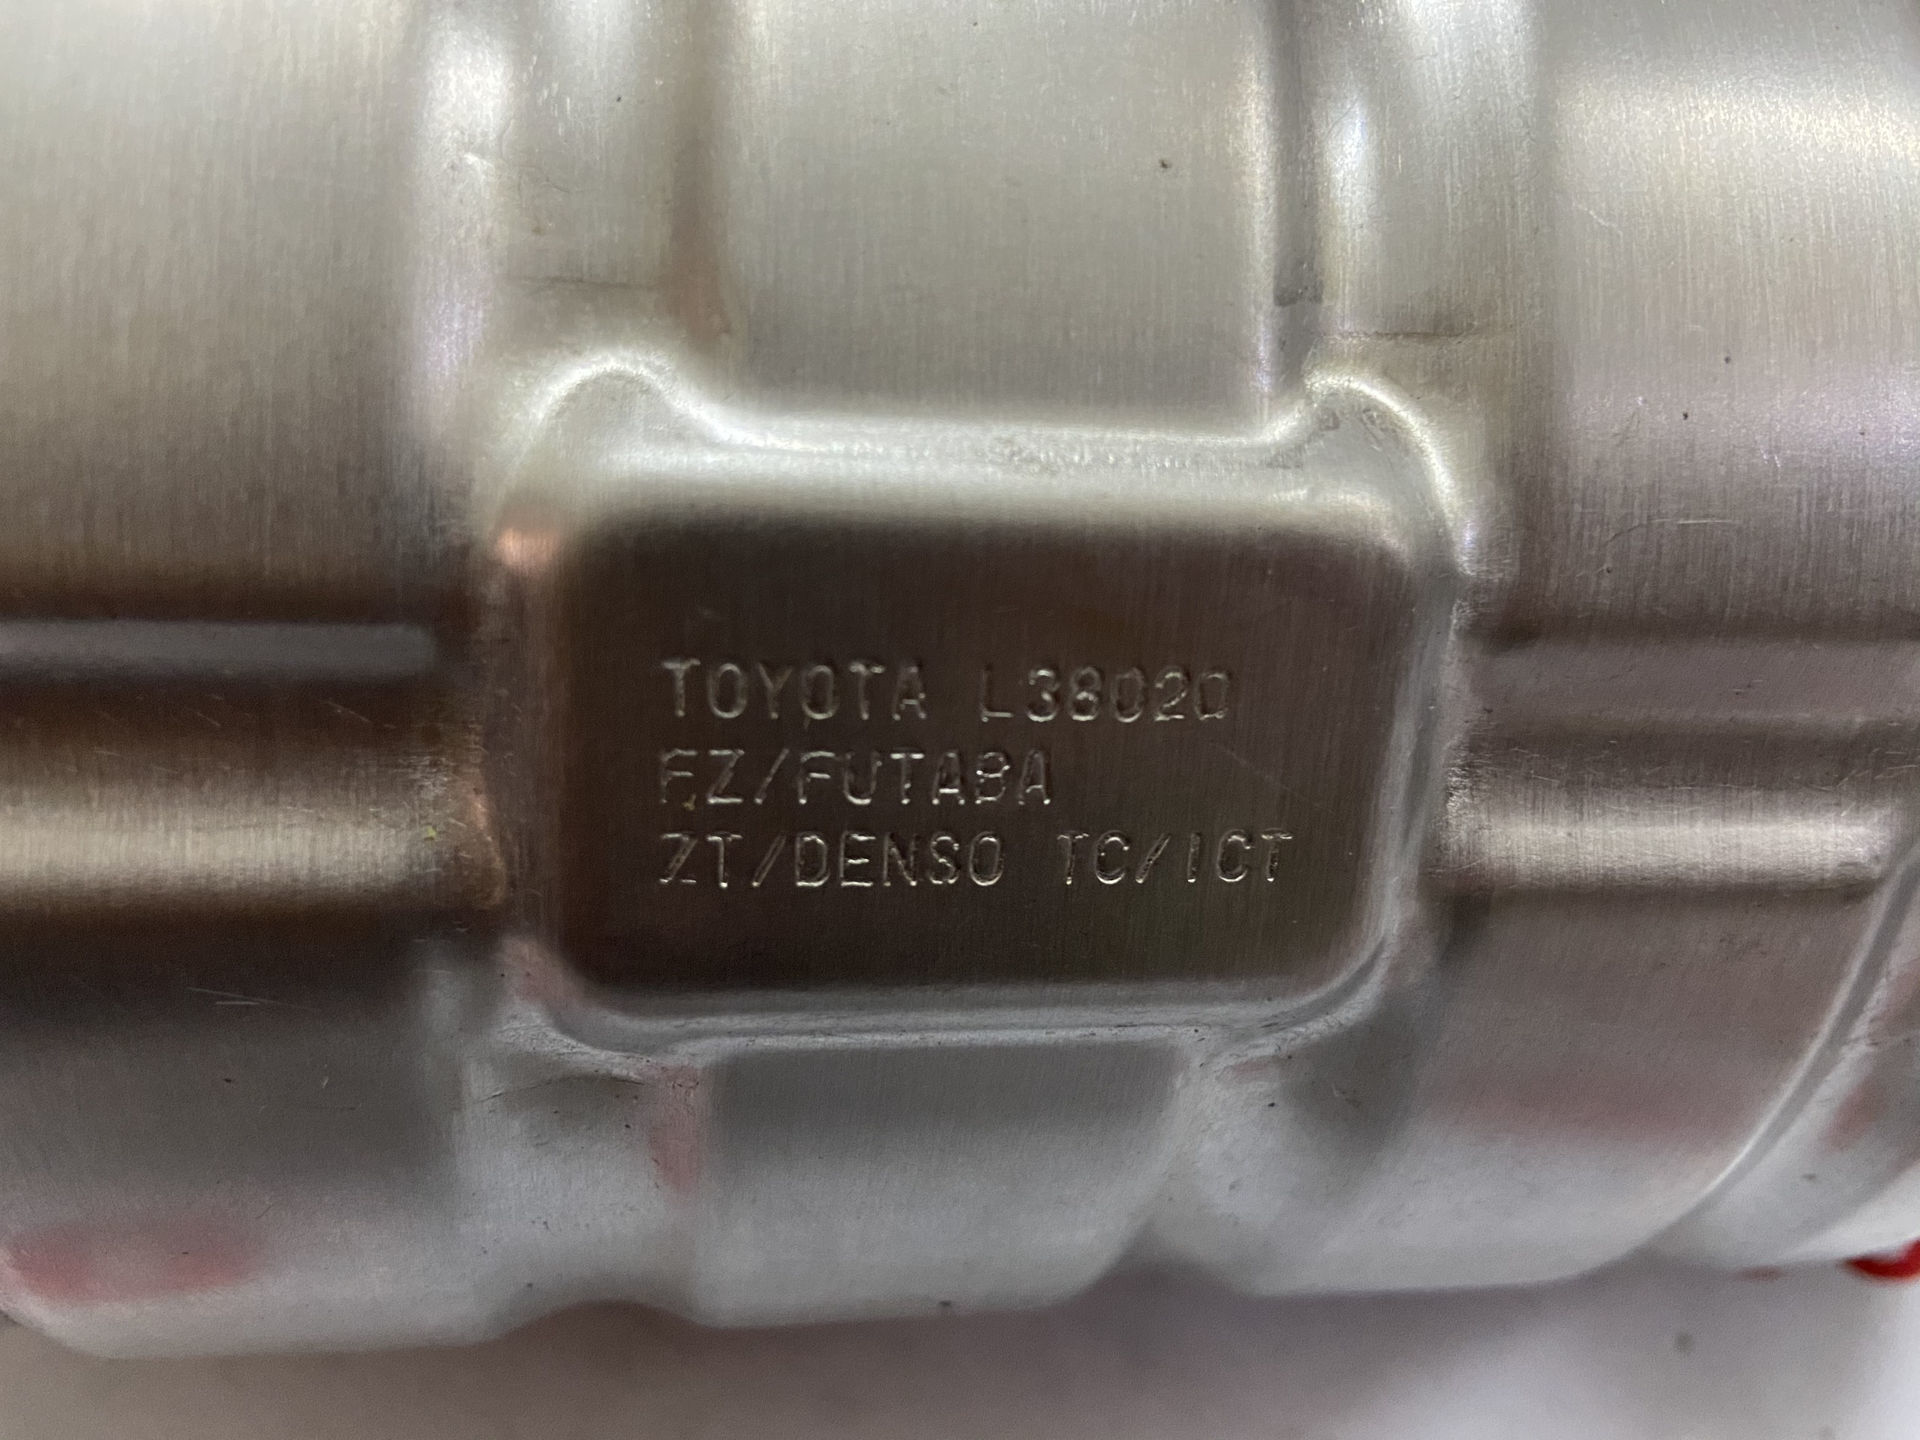 Picture of 17105-38020 Cổ xả, bầu catalyst Lexus LS460 chính hãng